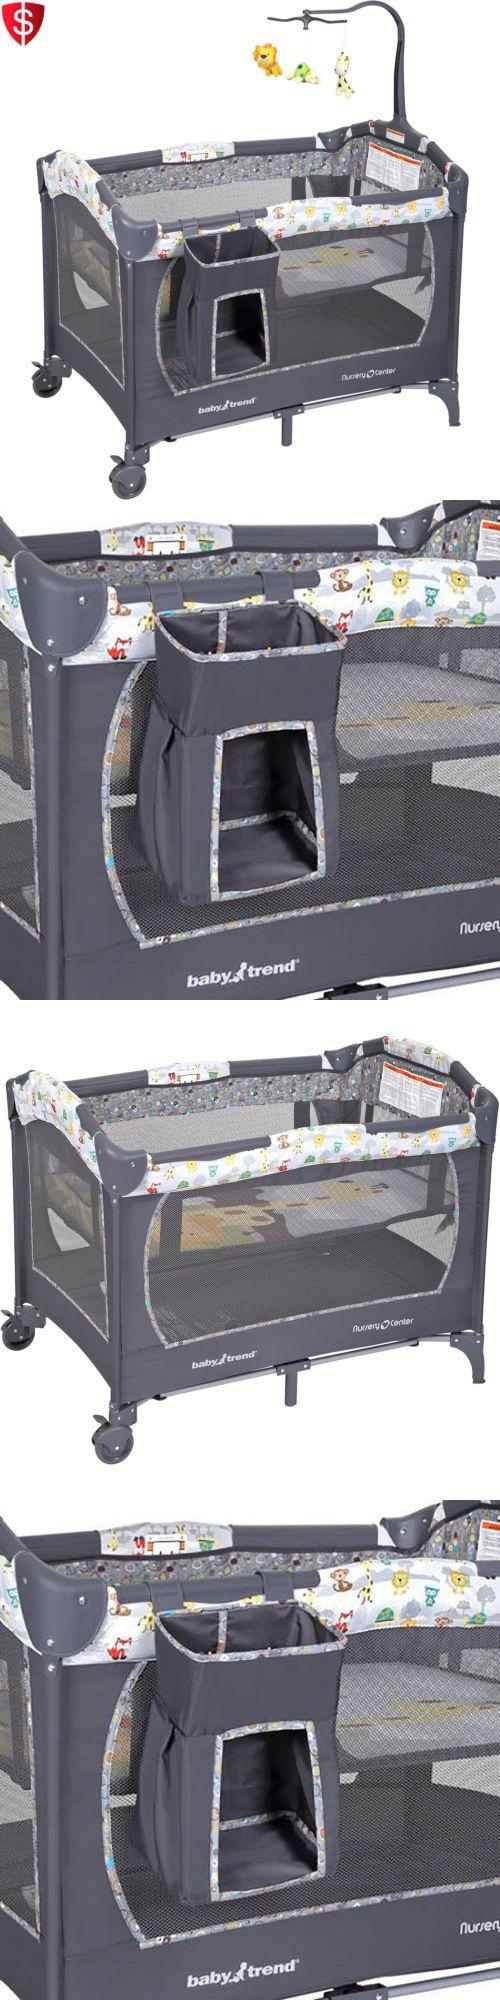 Nursery Furniture 20422: Baby Bassinet Crib Infant Bed Nursery Cradle Sleeper Newborn Playpen Beddin -> BUY IT NOW ONLY: $81.5 on eBay!